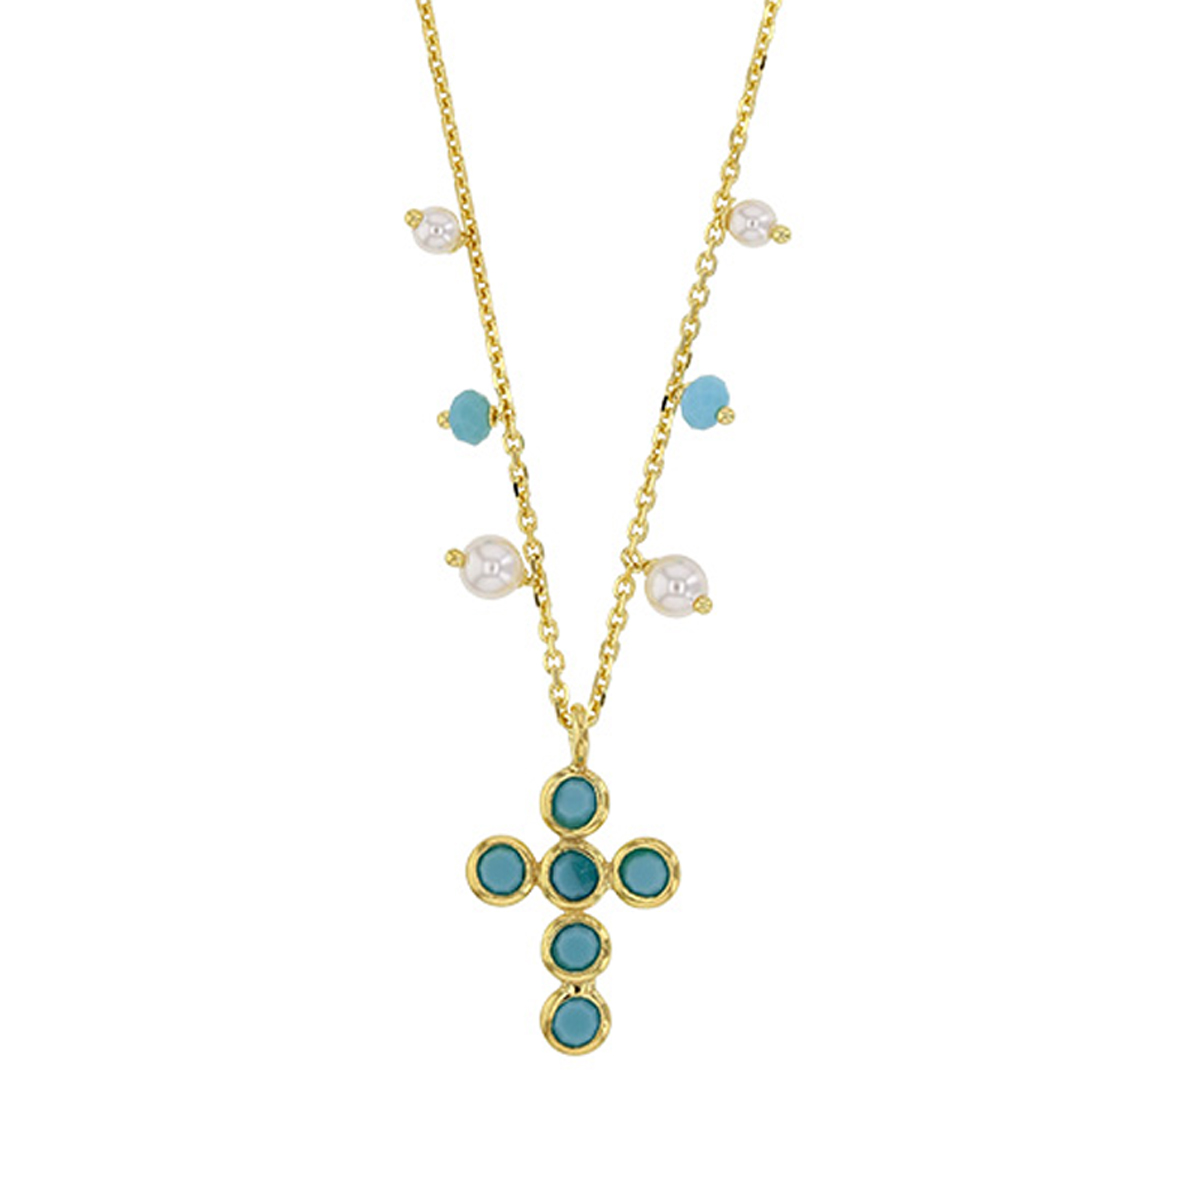 Collier Argent artisanal \'Croix Gypsy\' turquoise doré - 17x13 mm - [R5469]